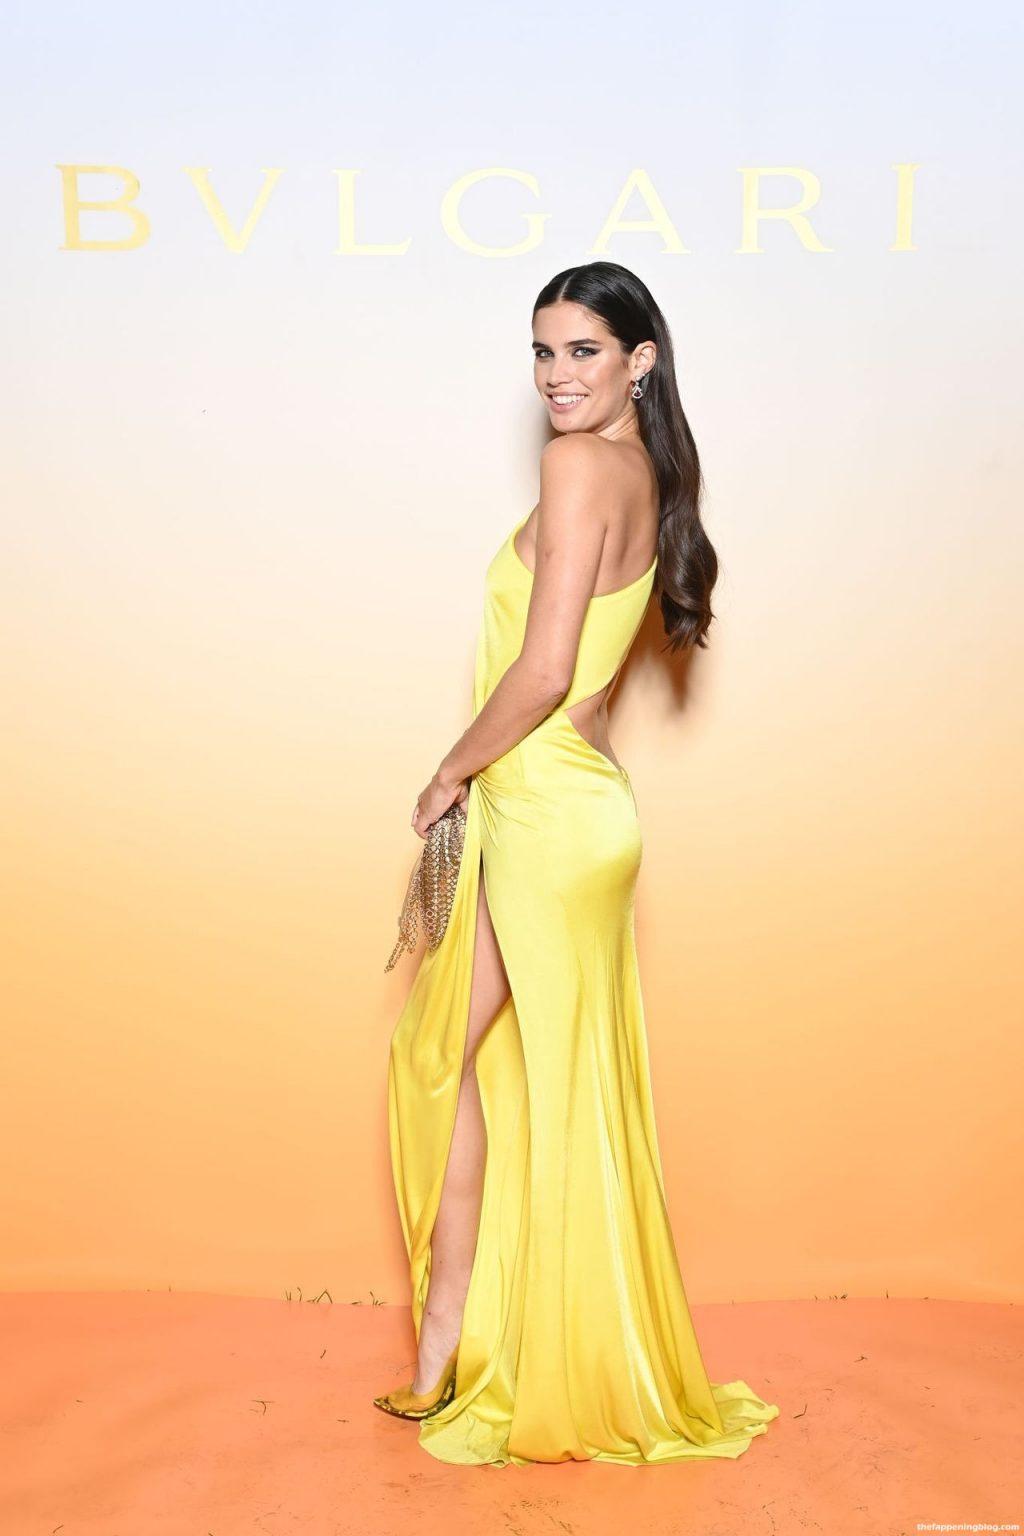 Sara Sampaio Poses in a Glamorous Lemon A-symmetrical Gown at the Bulgari Event (14 Photos)